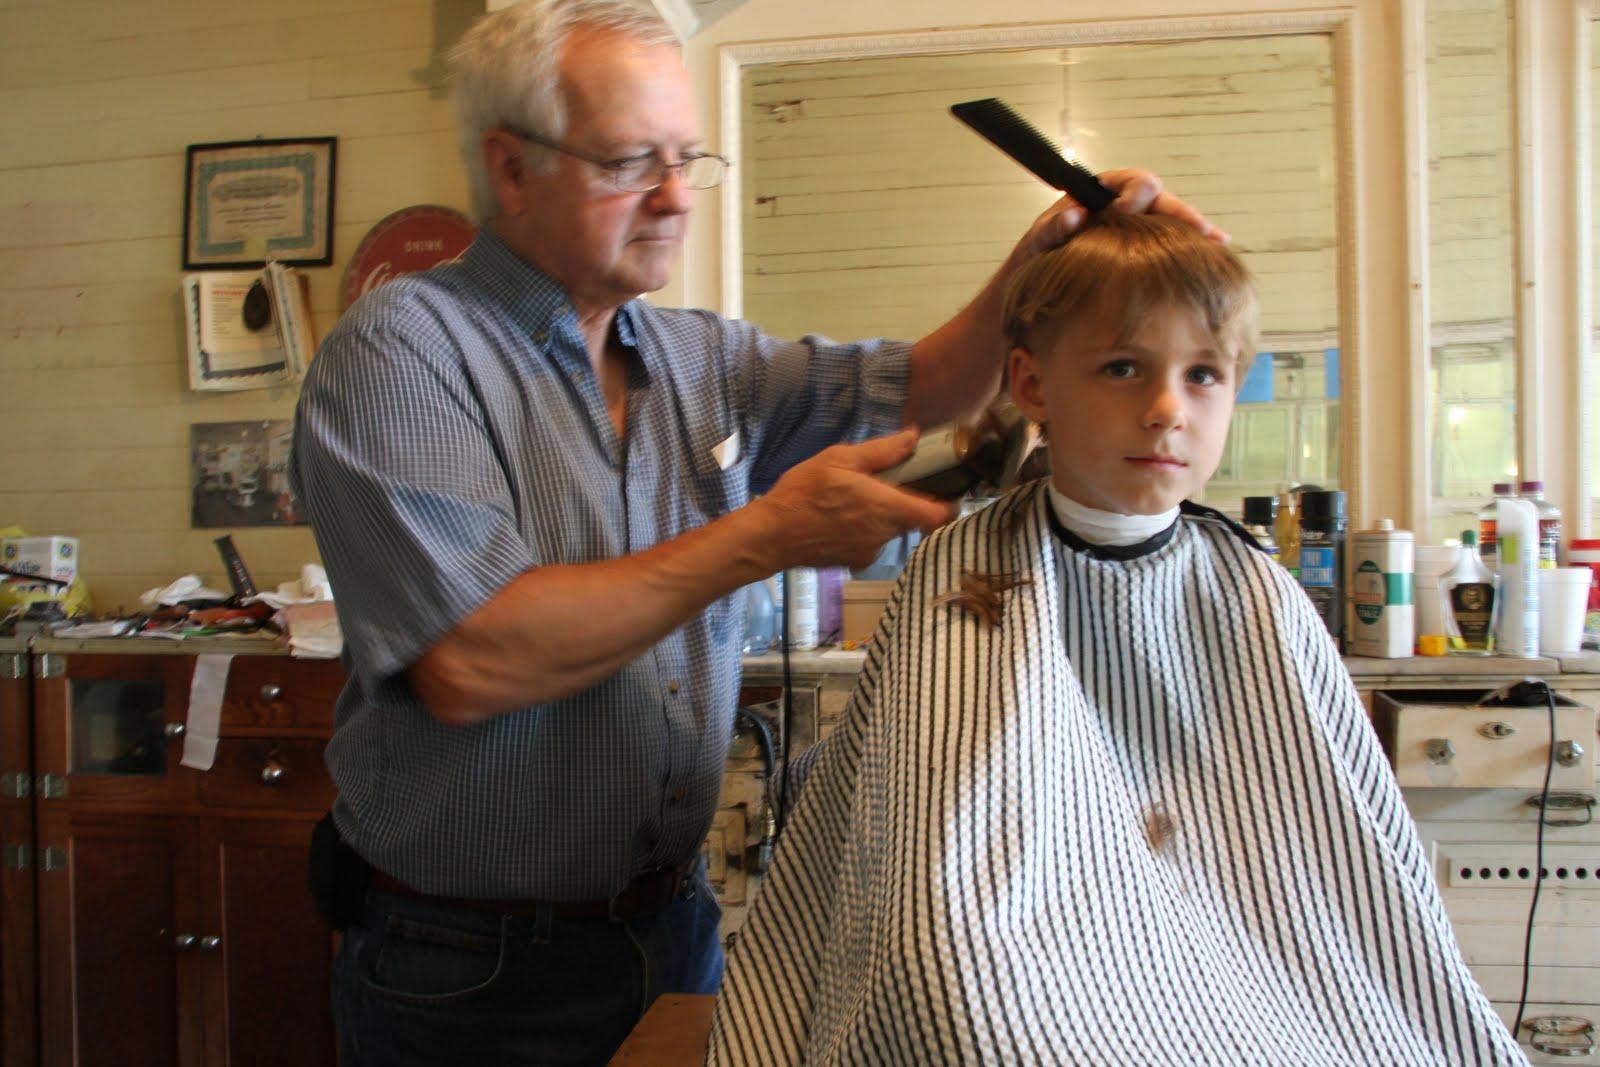 11+ New Woman Getting Haircut In Barbershop